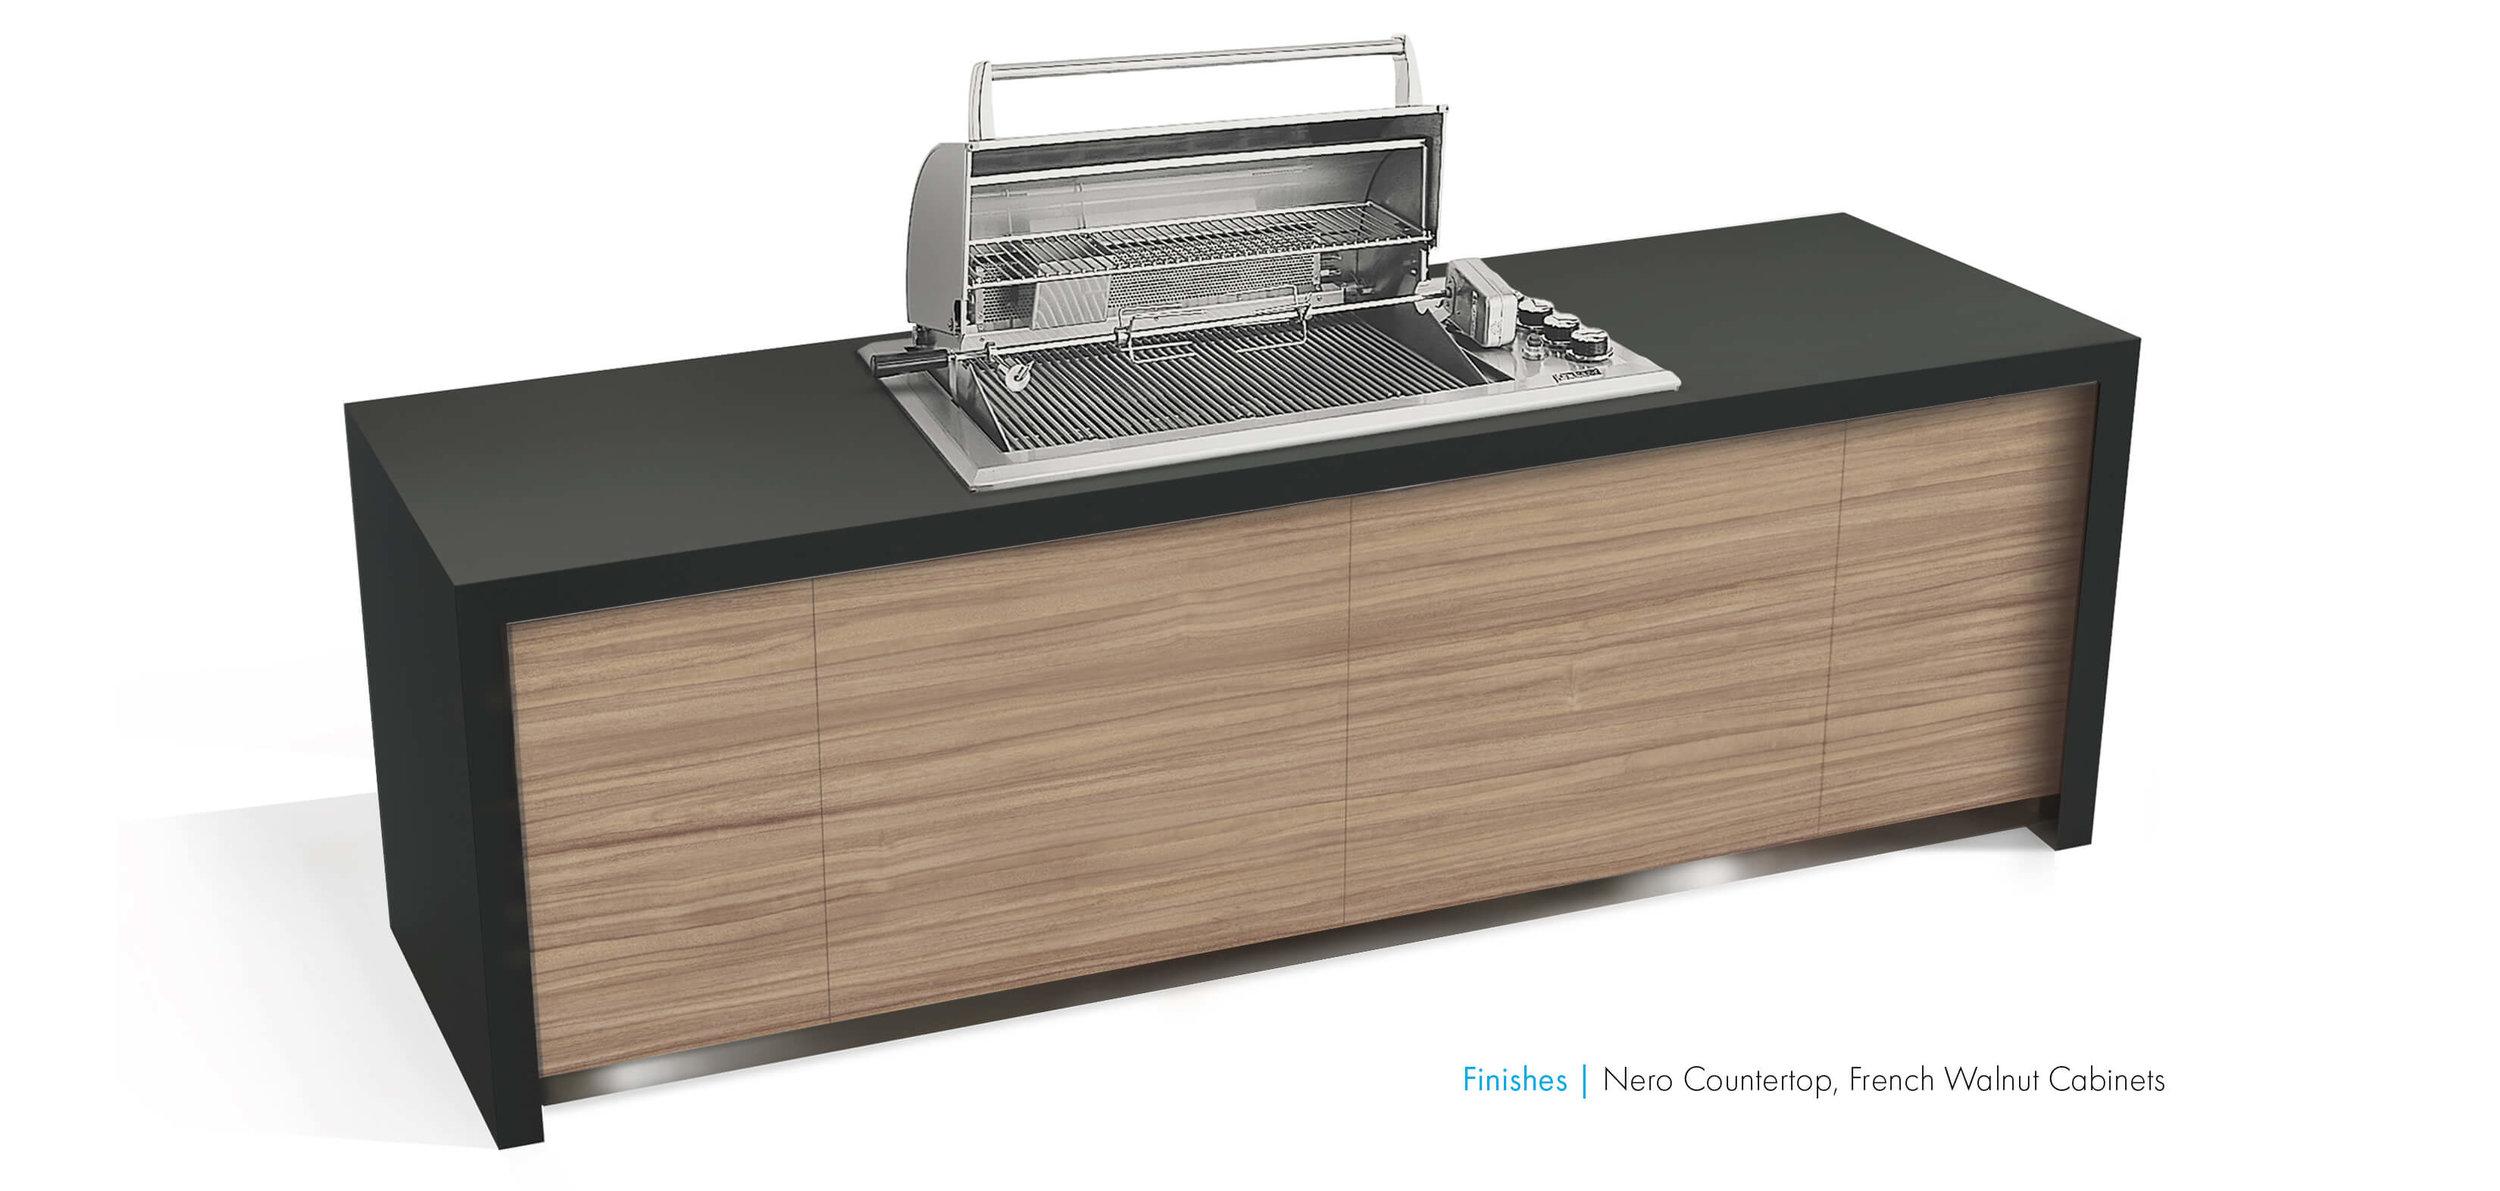 Alfresco French Walnut, Nero Countertop.jpg